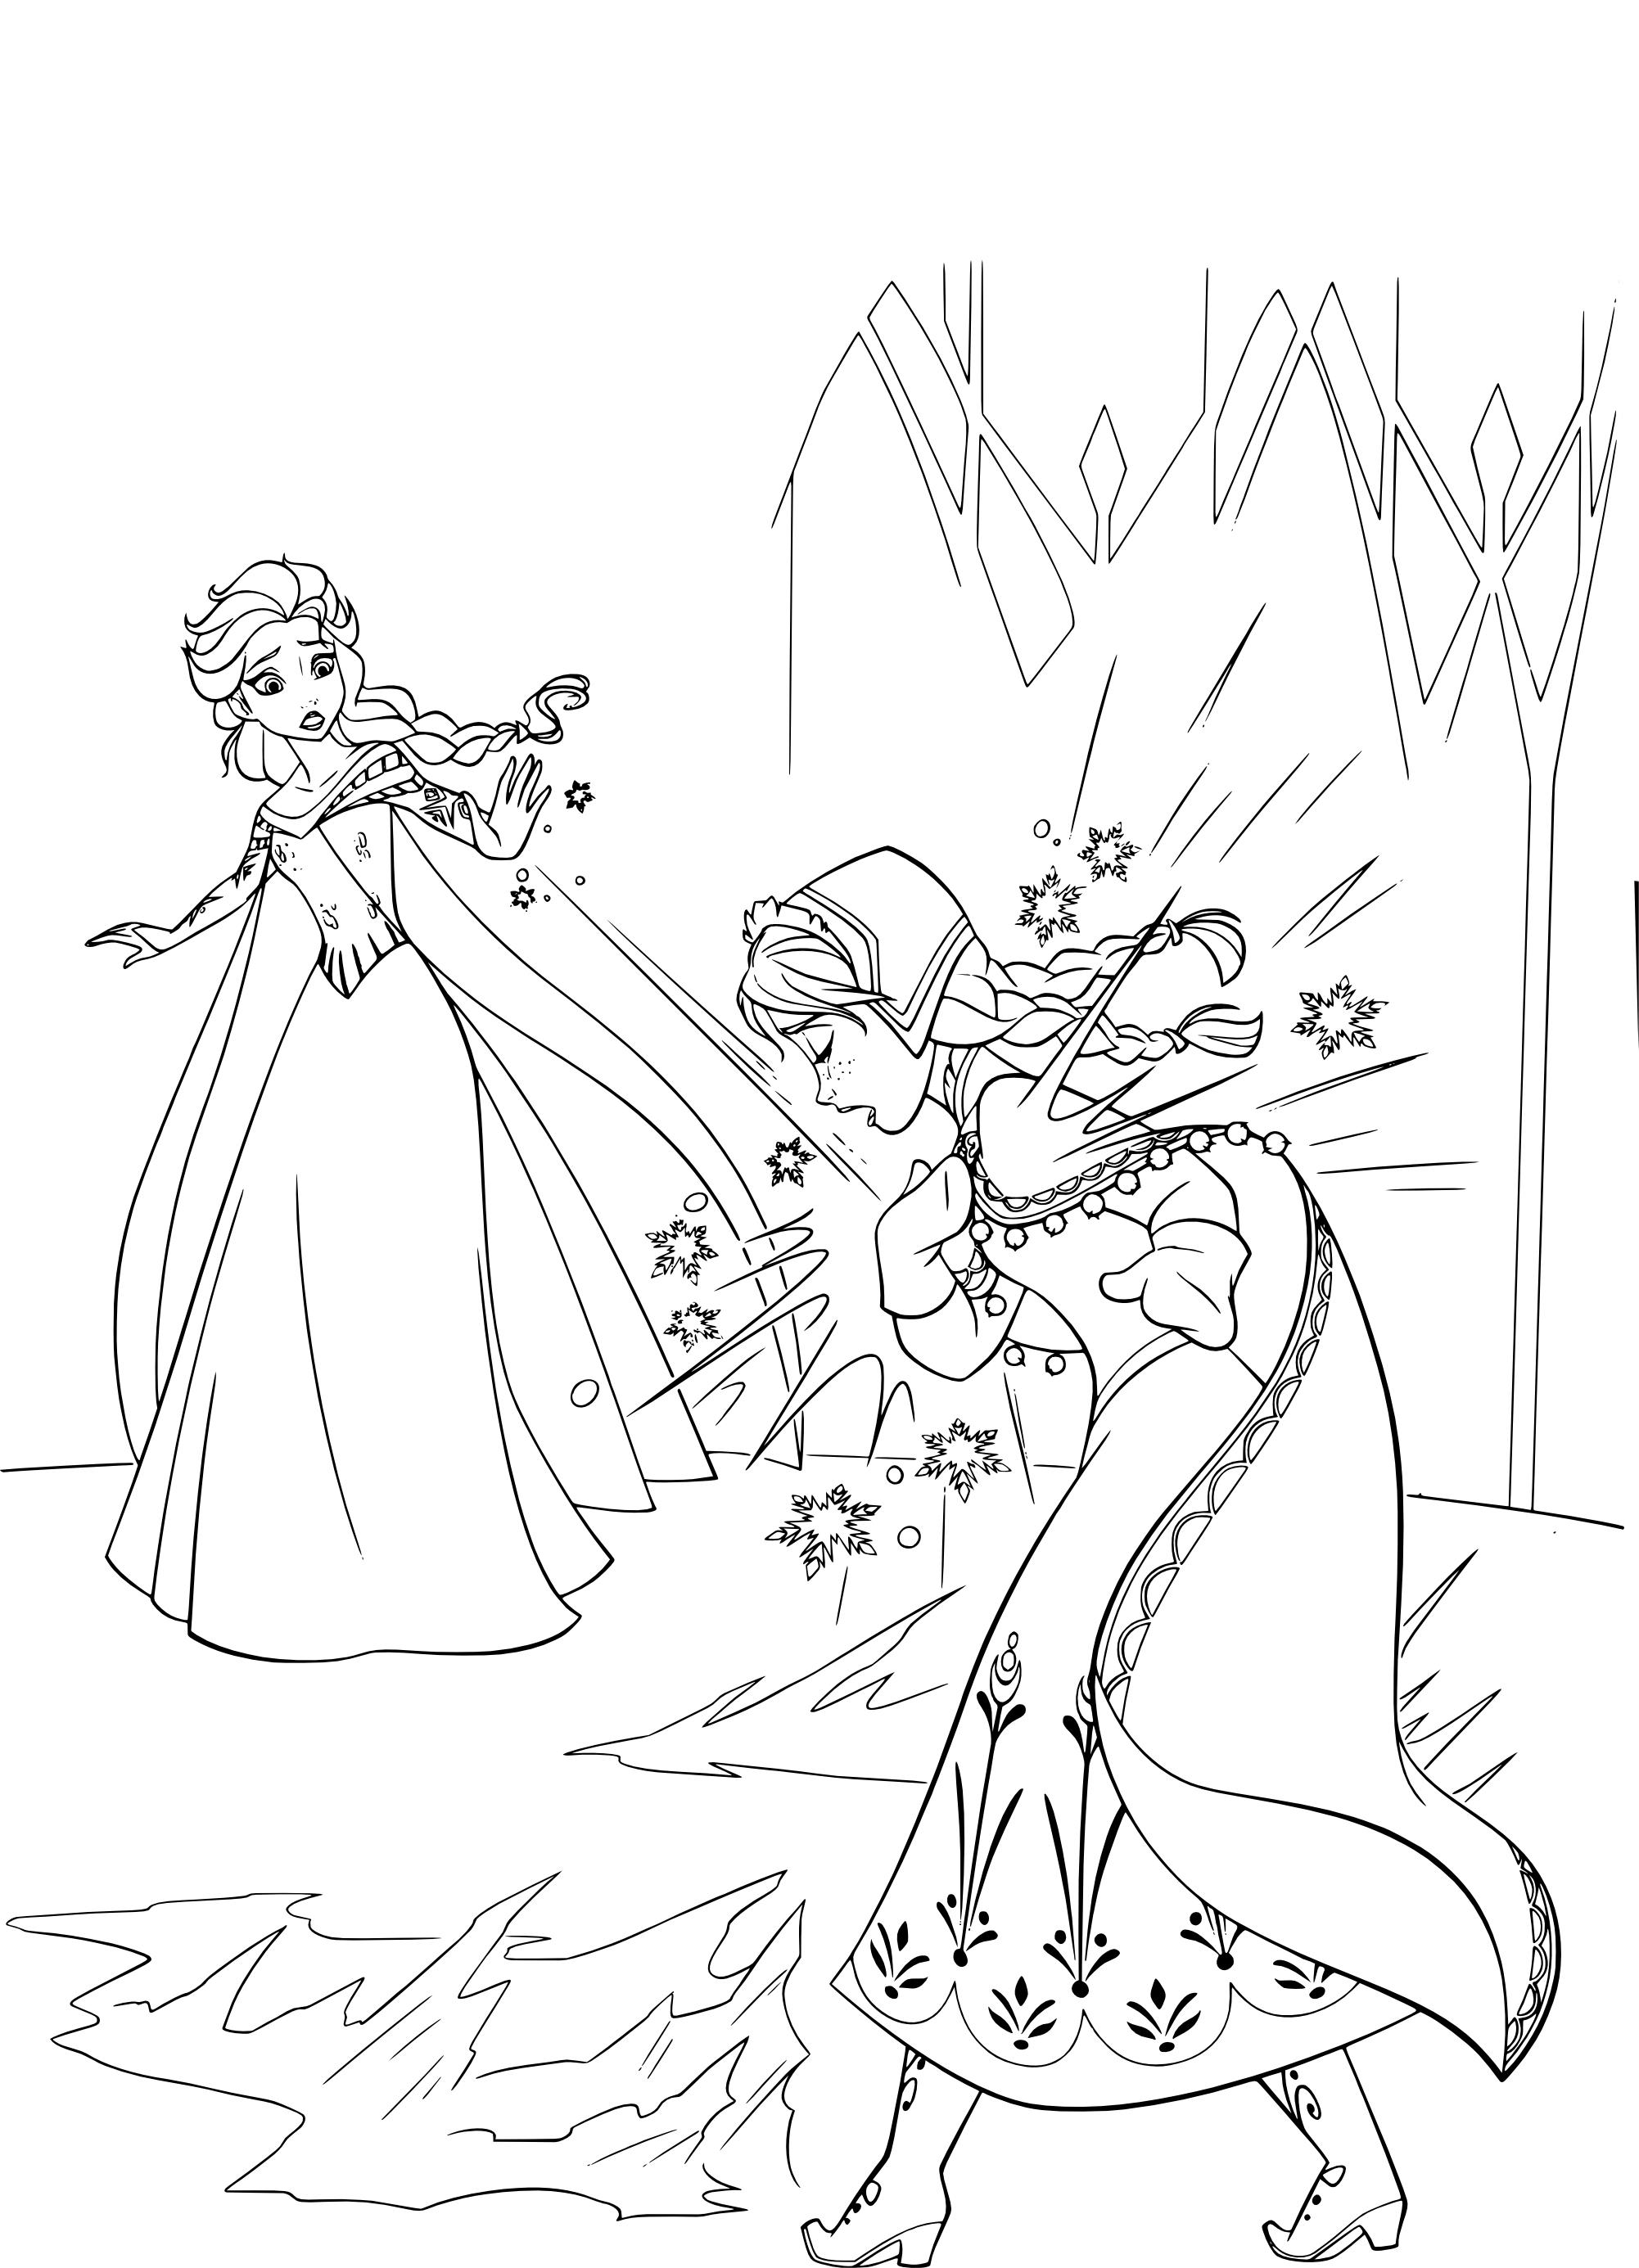 Coloriage Princesses Disney Elsa Et Anna A Imprimer